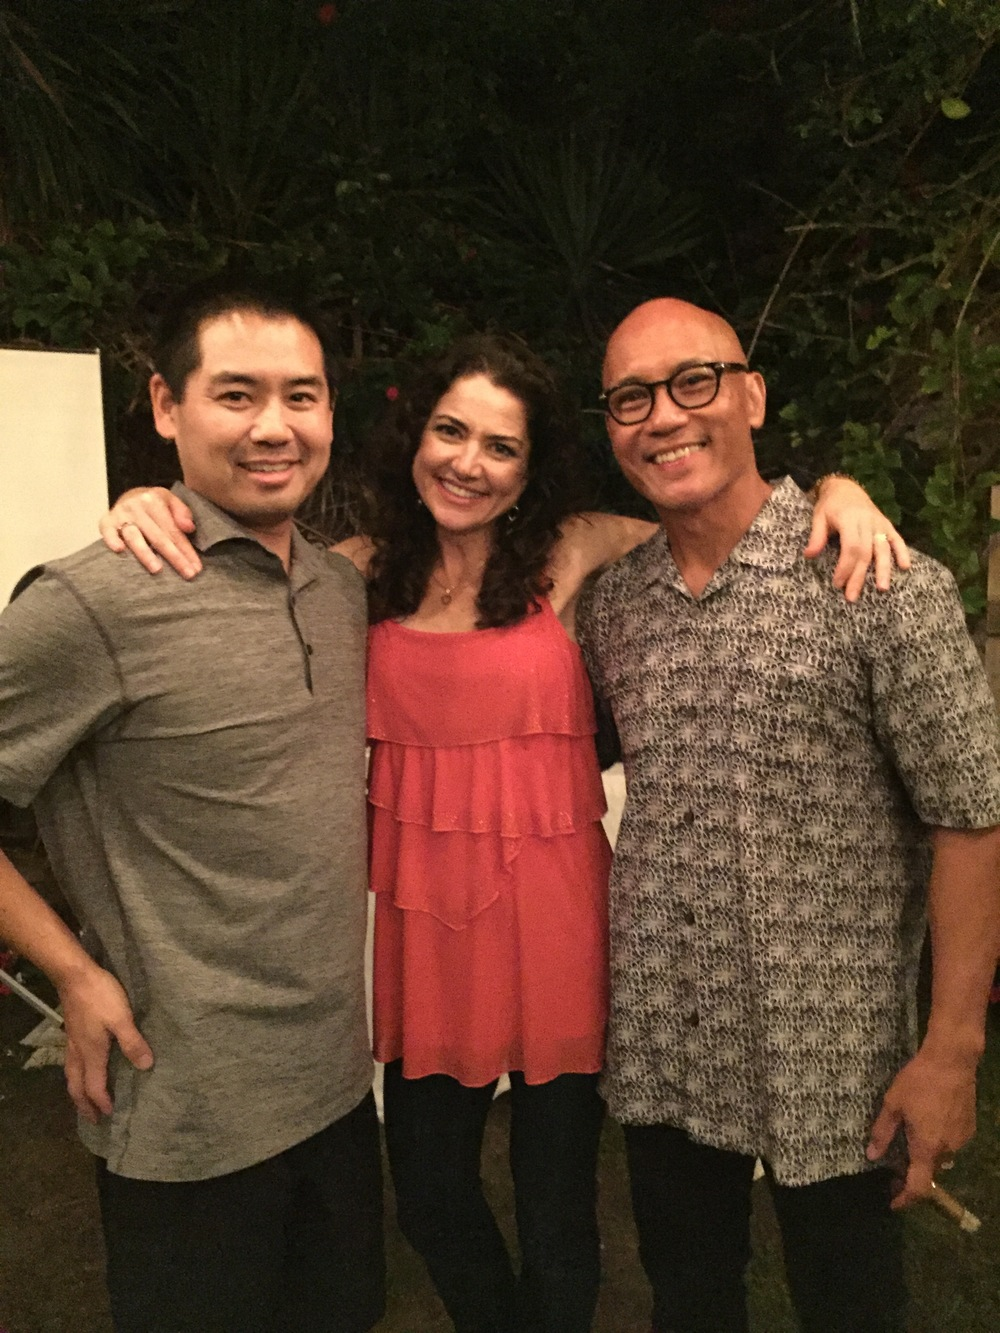 The birthday party DJ, Justin Kanoya, with the birthday boy, Adrian and his wife, Celestine.